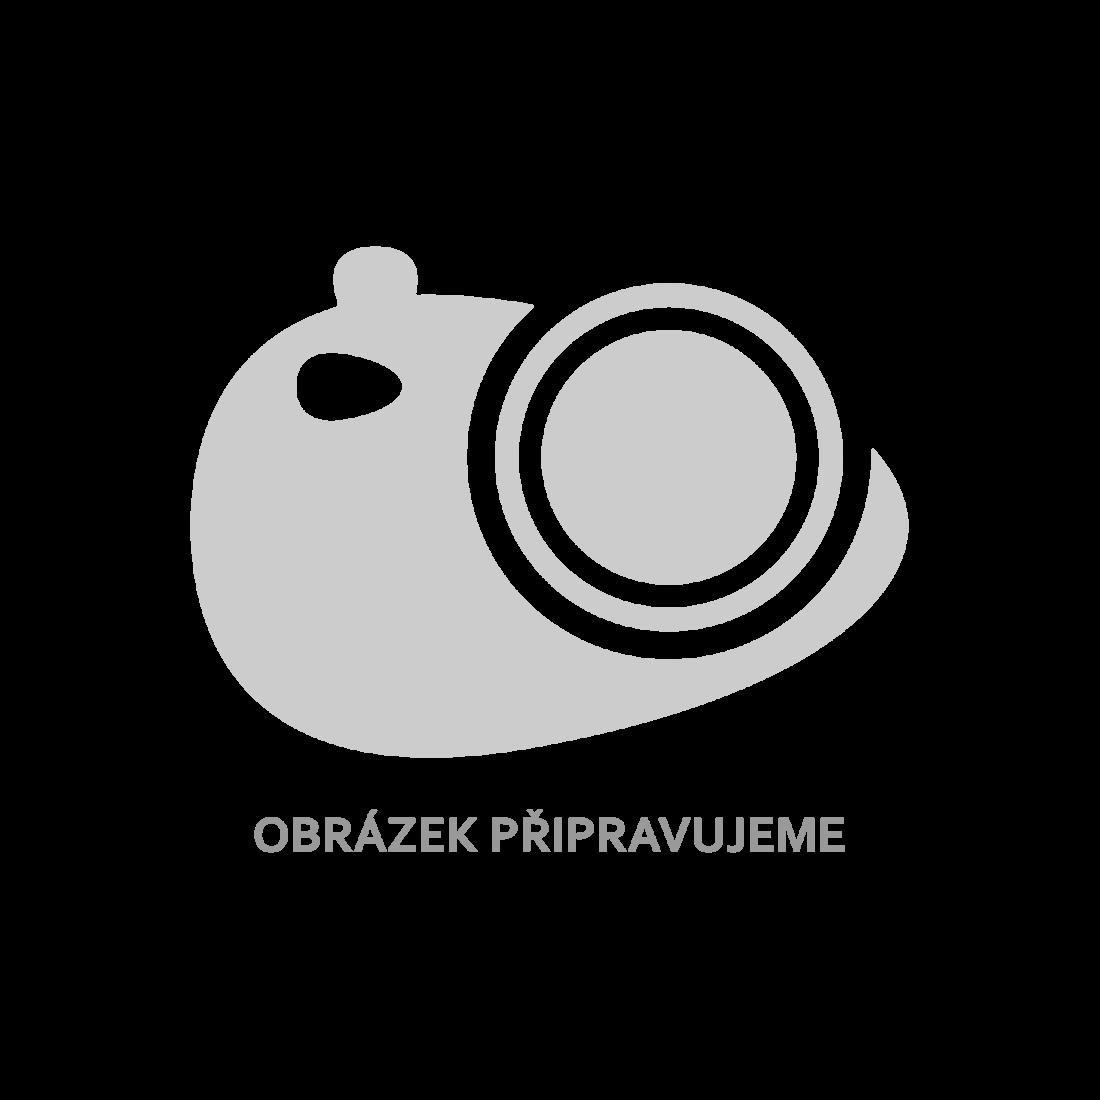 vidaXL Bistro stolek bílý Ø 70 cm plast [48796]